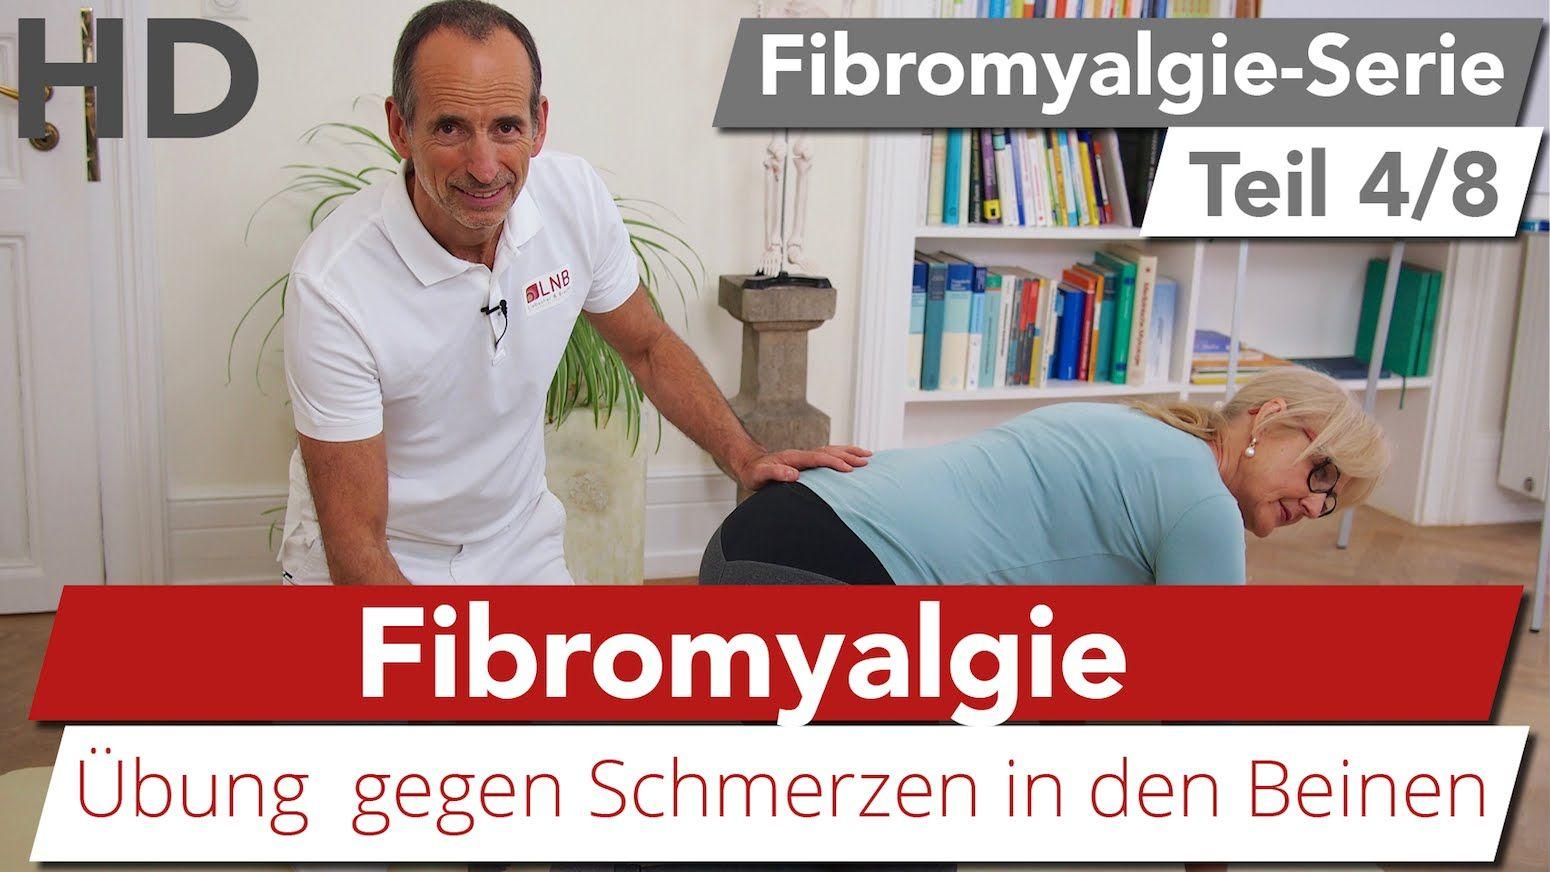 Fibromyalgie Übung // Beinschmerzen, Knieschmerzen, Faser..